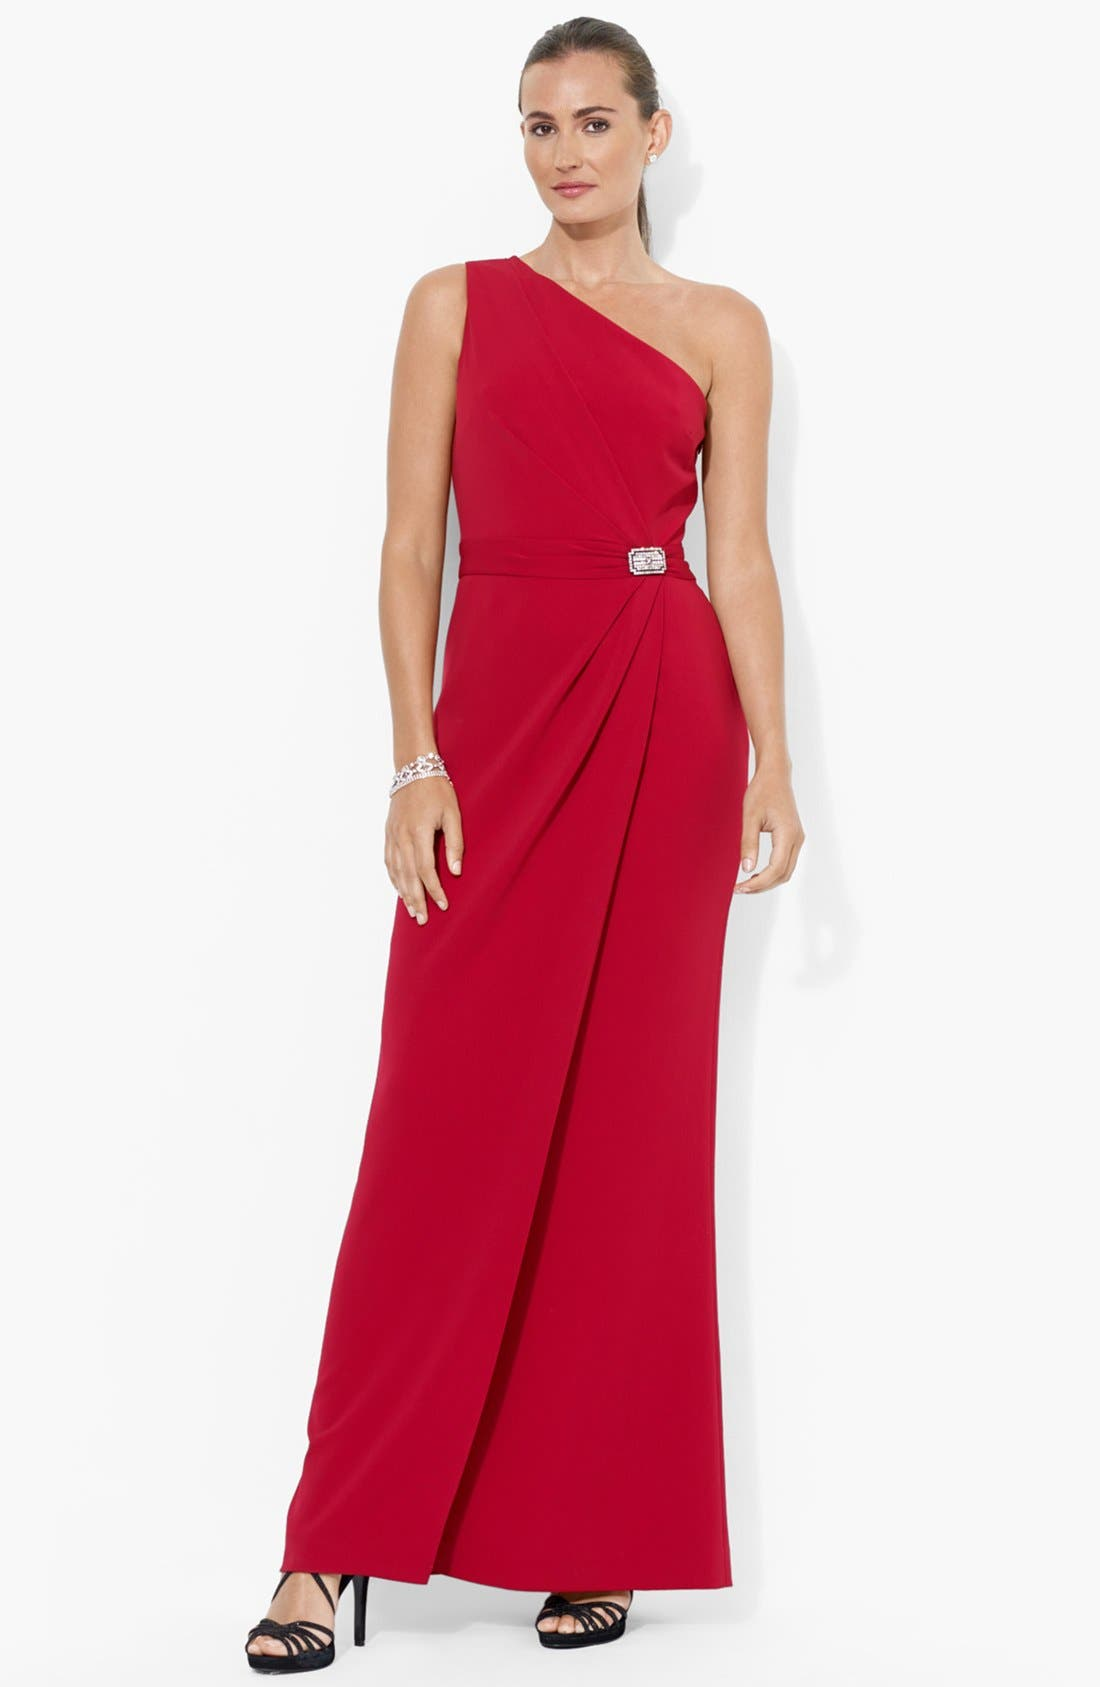 Alternate Image 1 Selected - Lauren Ralph Lauren Embellished One-Shoulder Gown